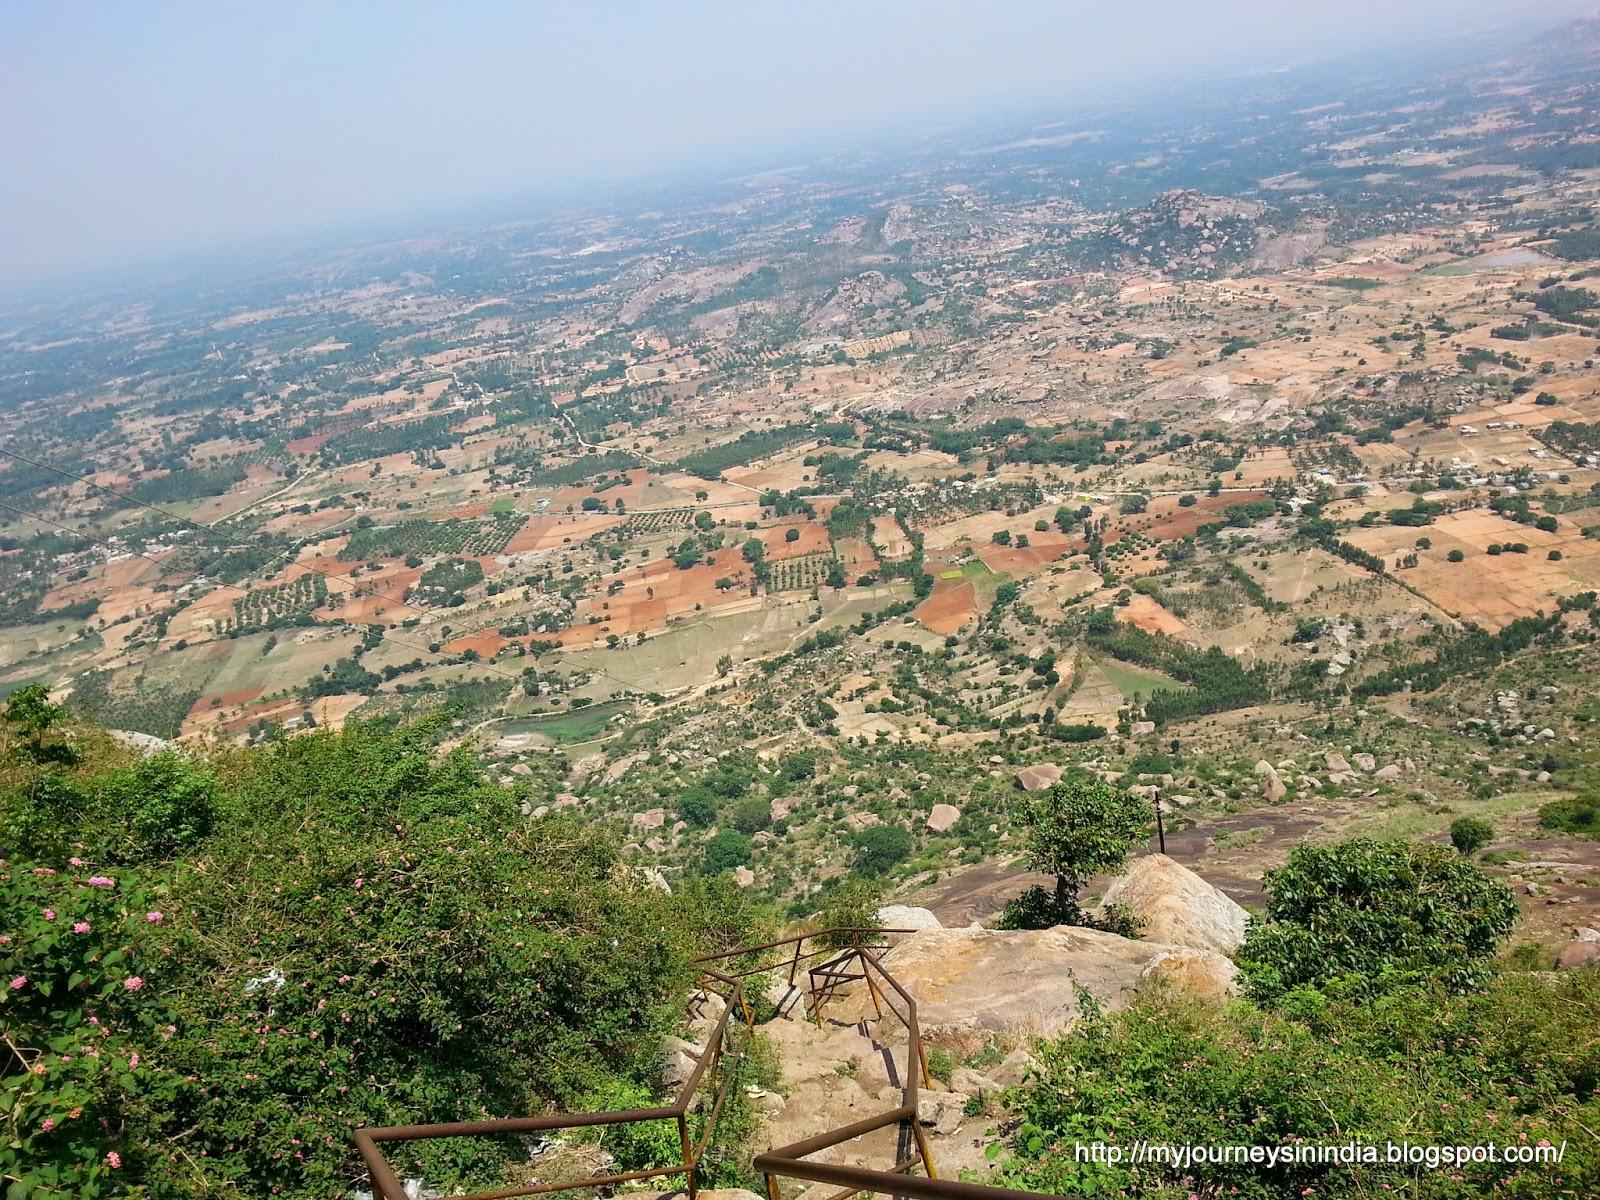 Shivagange